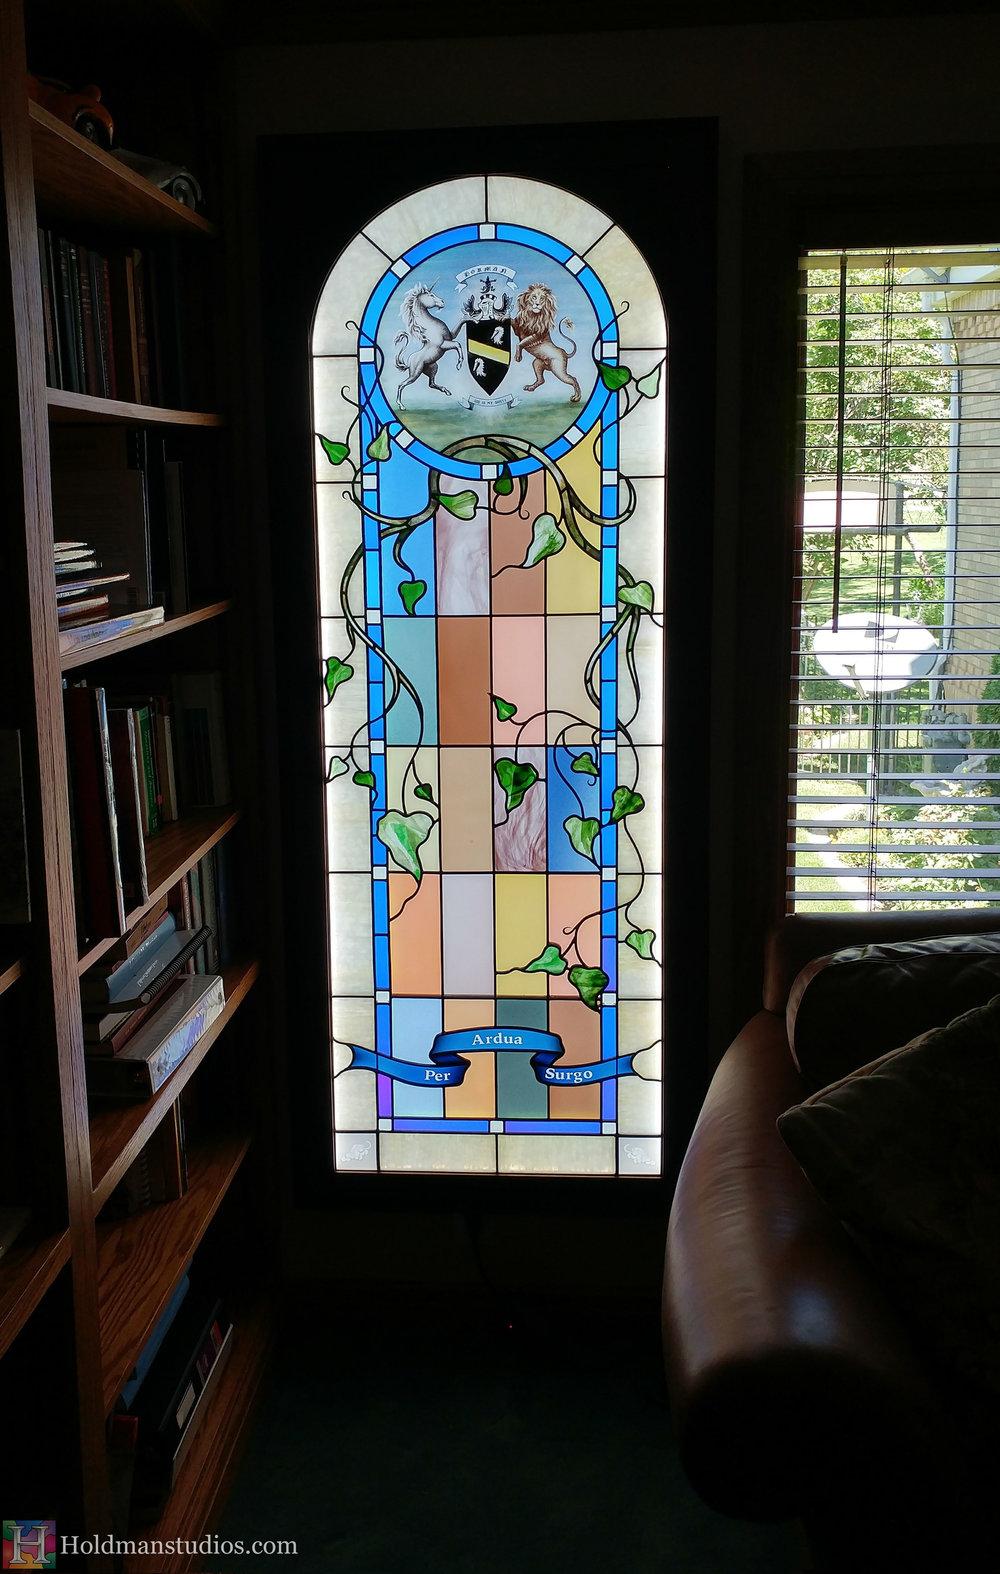 Holdman-studios-stained-glass-window-per-ardus-surgo-vine-leaves-plants-lion-unicorn-coat-of-arms.jpg